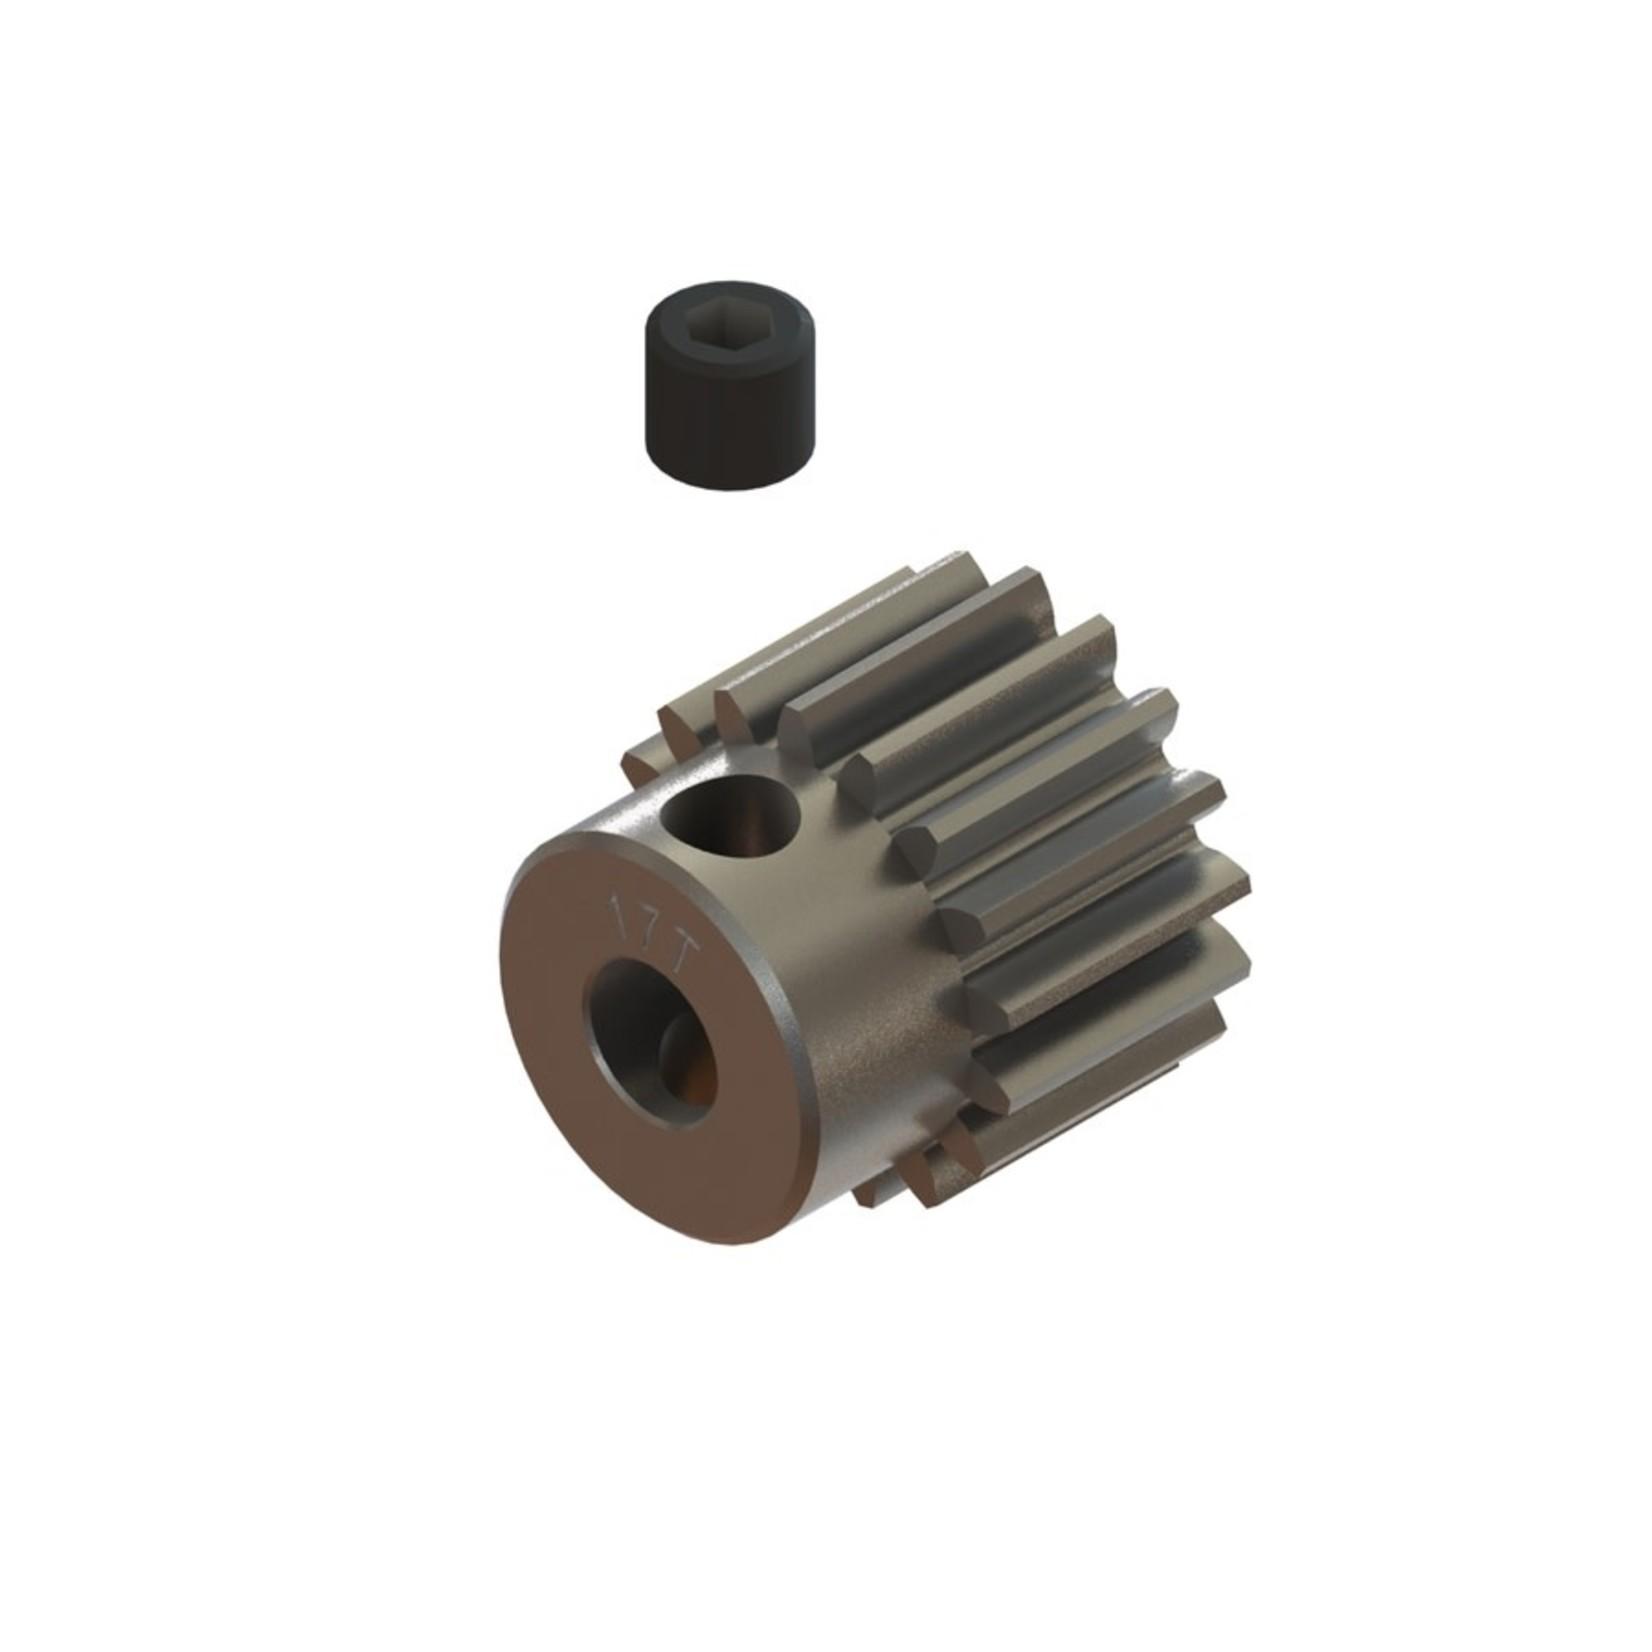 ARRMA AR310383 Arrma Pinion Gear 17T 48DP Mega 4x4